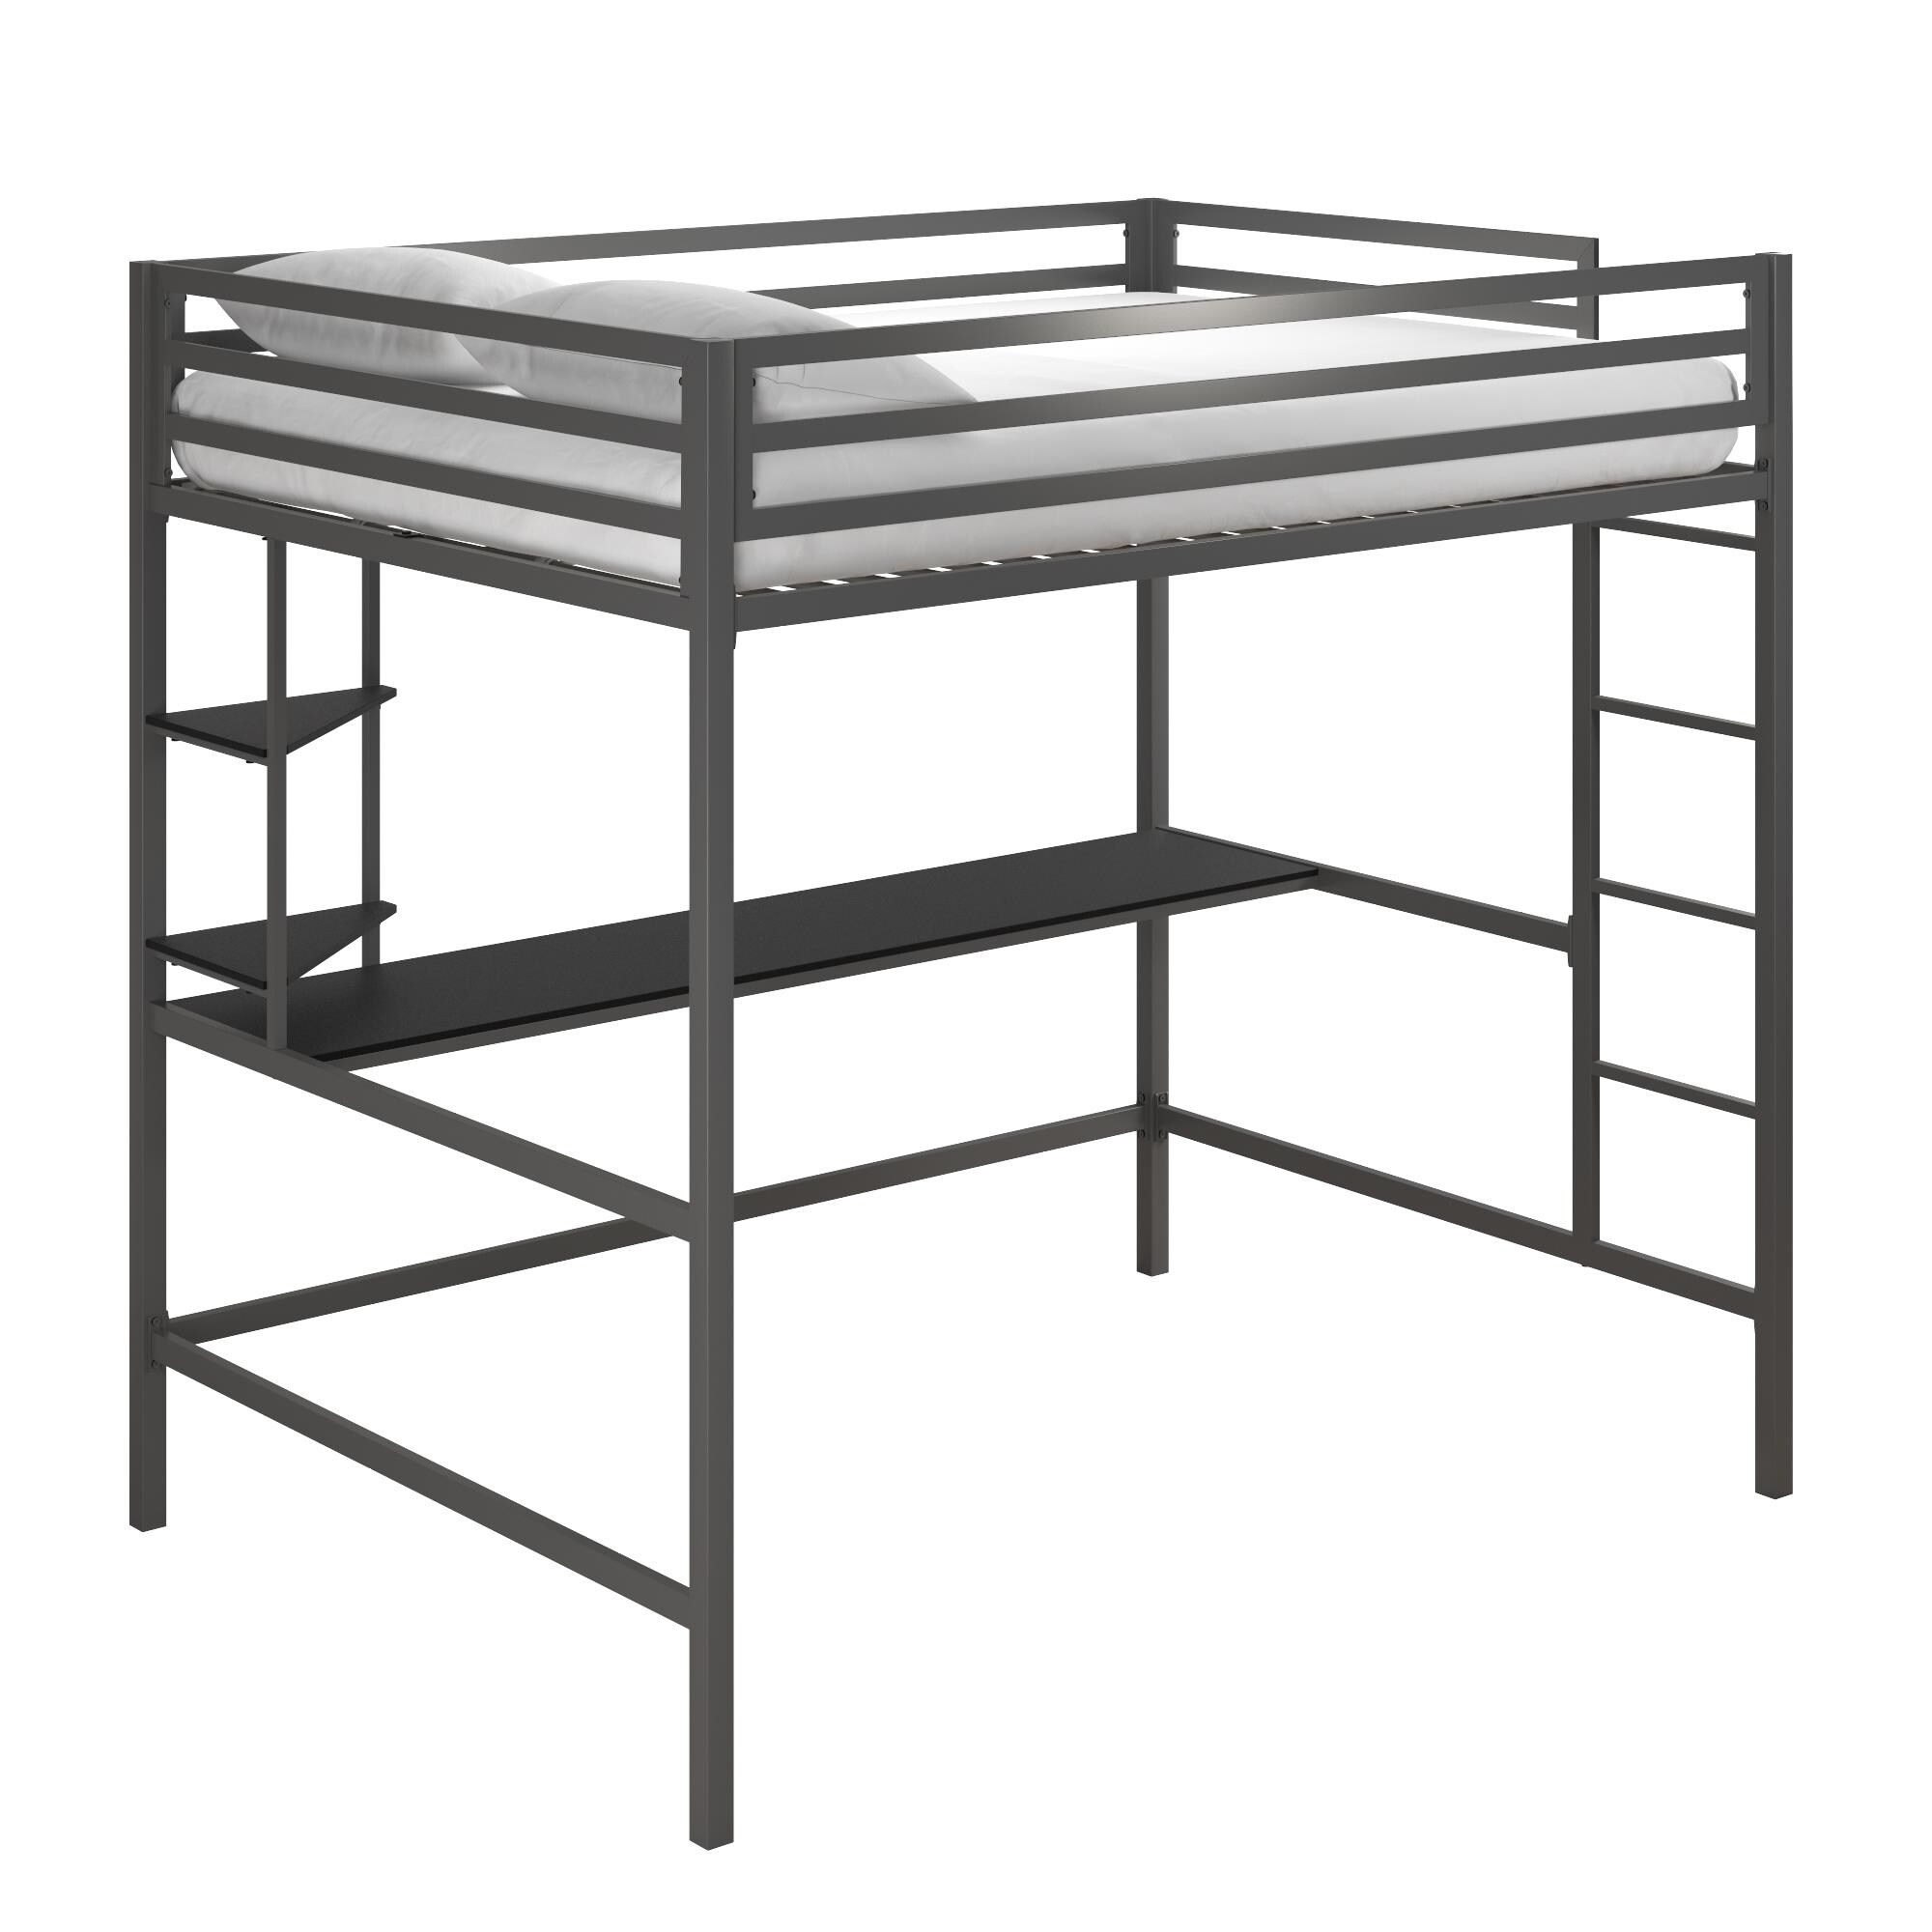 Novogratz Maxwell Metal Loft Bed With Desk Shelves On Sale Overstock 28640685